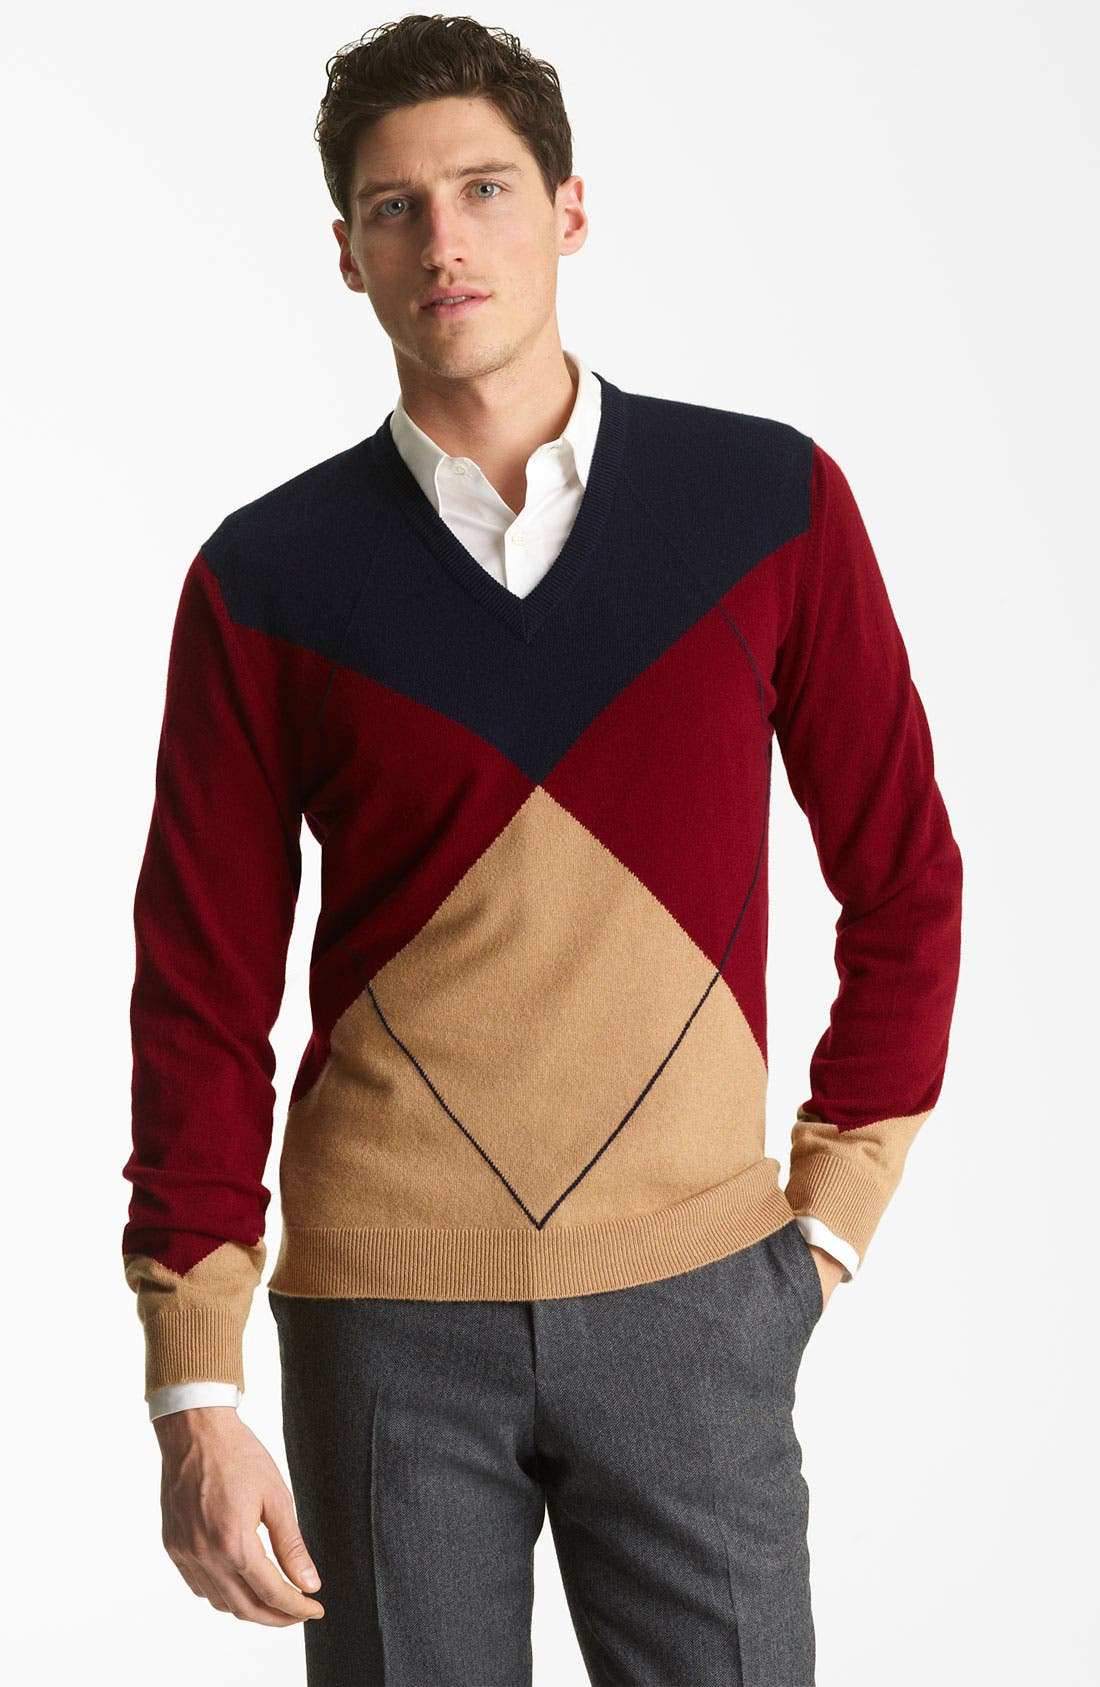 Alternate Image 1 Selected - Pringle of Scotland Argyle V-Neck Cashmere Sweater